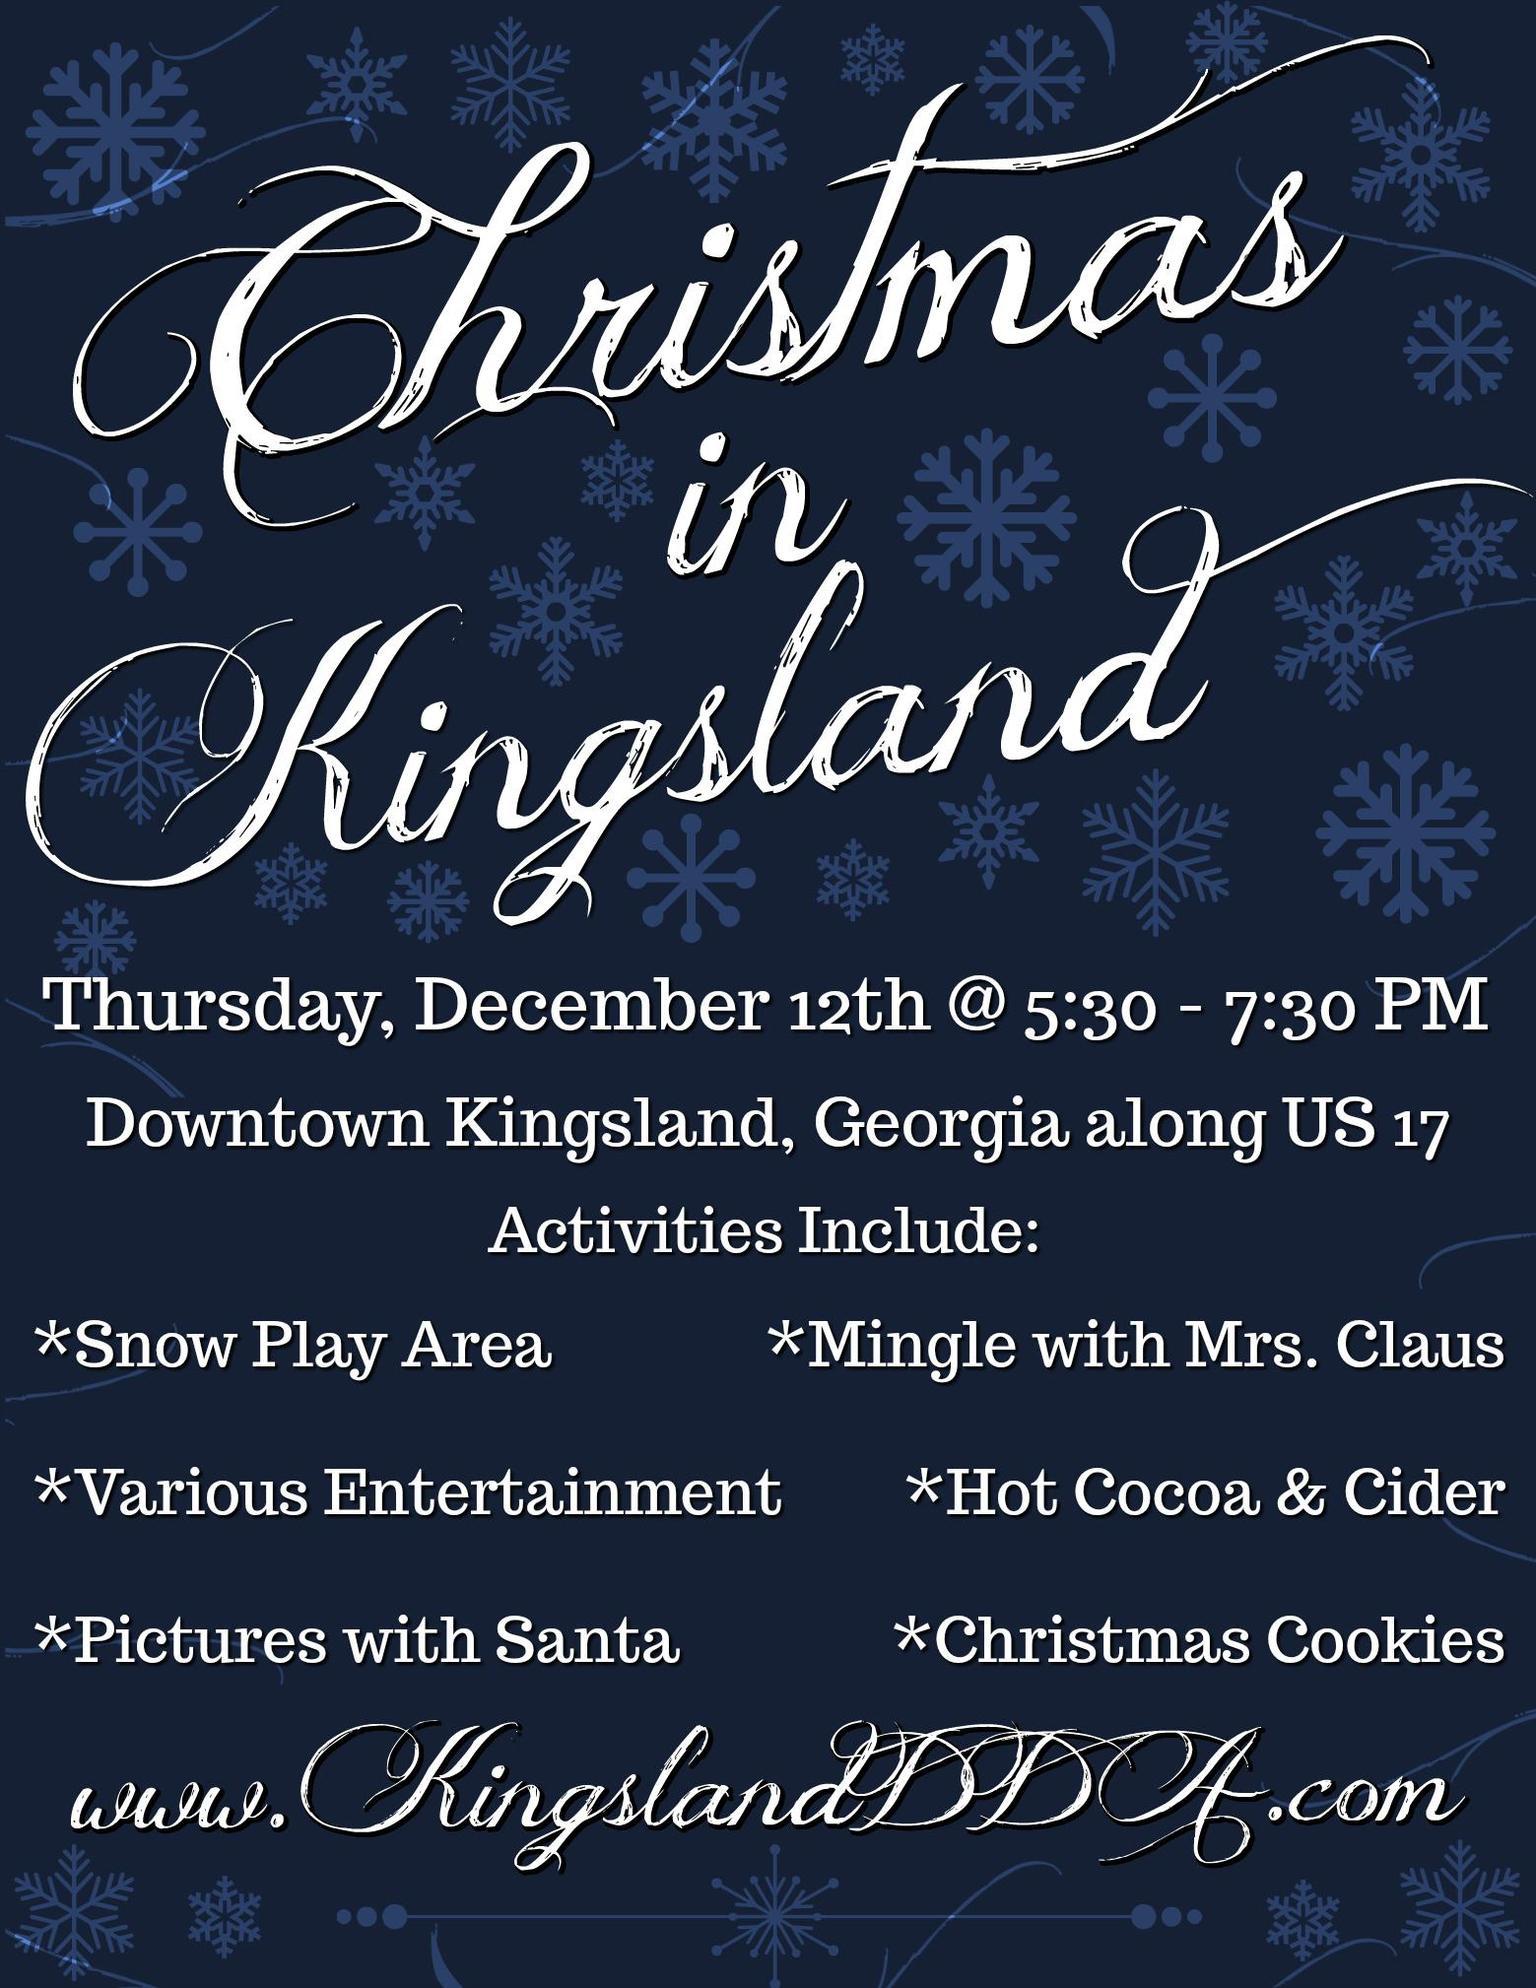 Christmas in Kingsland Schedule 2019